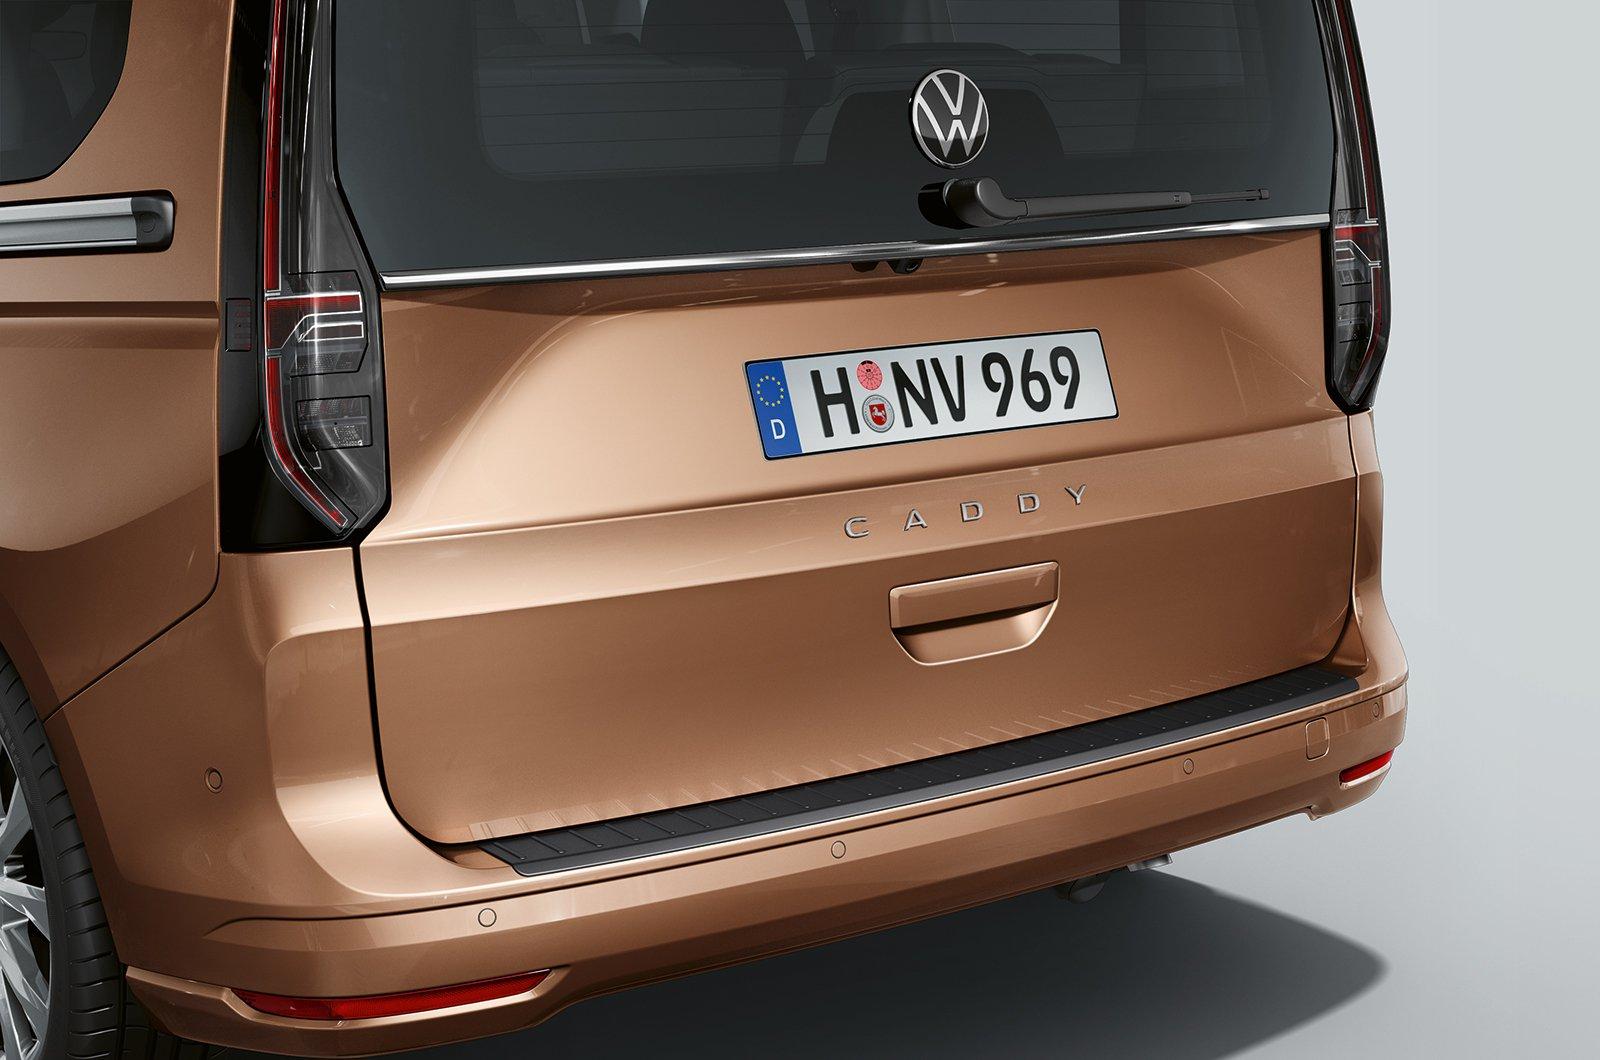 Volkswagen sill protector